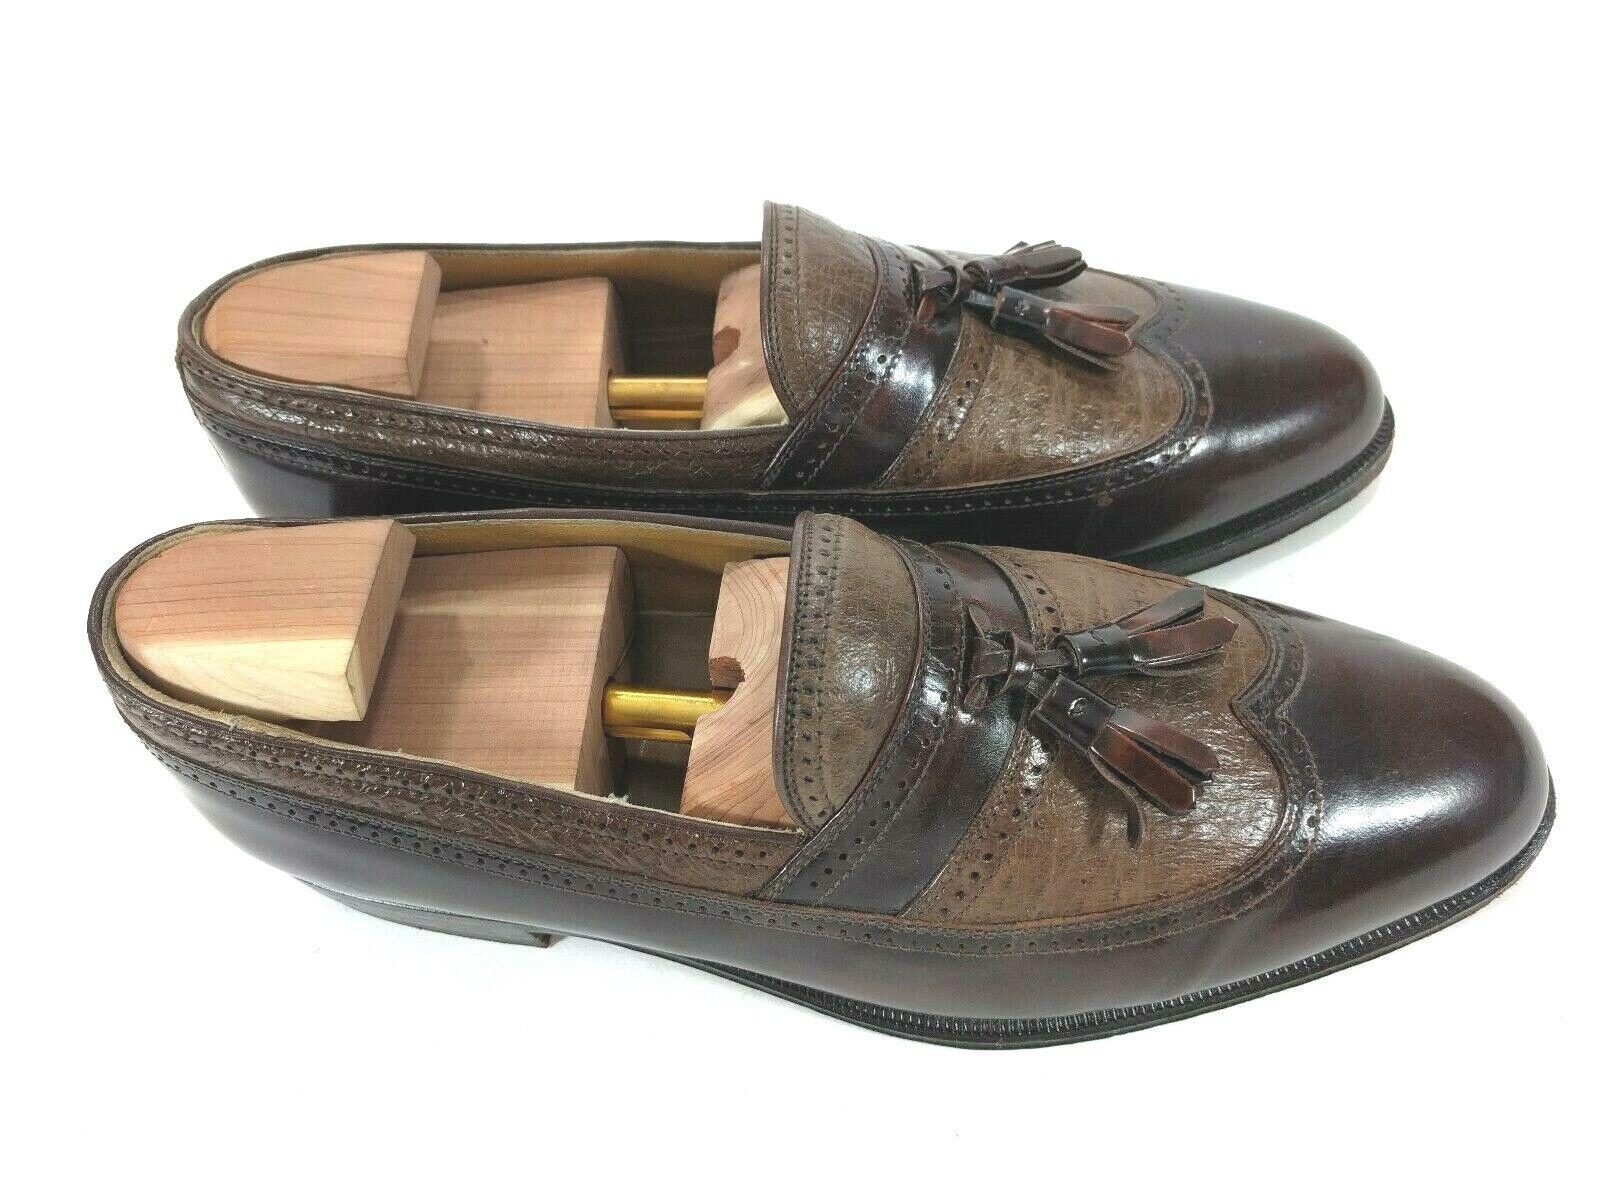 Johnston & Murphy Domani Brown 6920 Tassel Wingtip  Loafers Men's 9.5 M